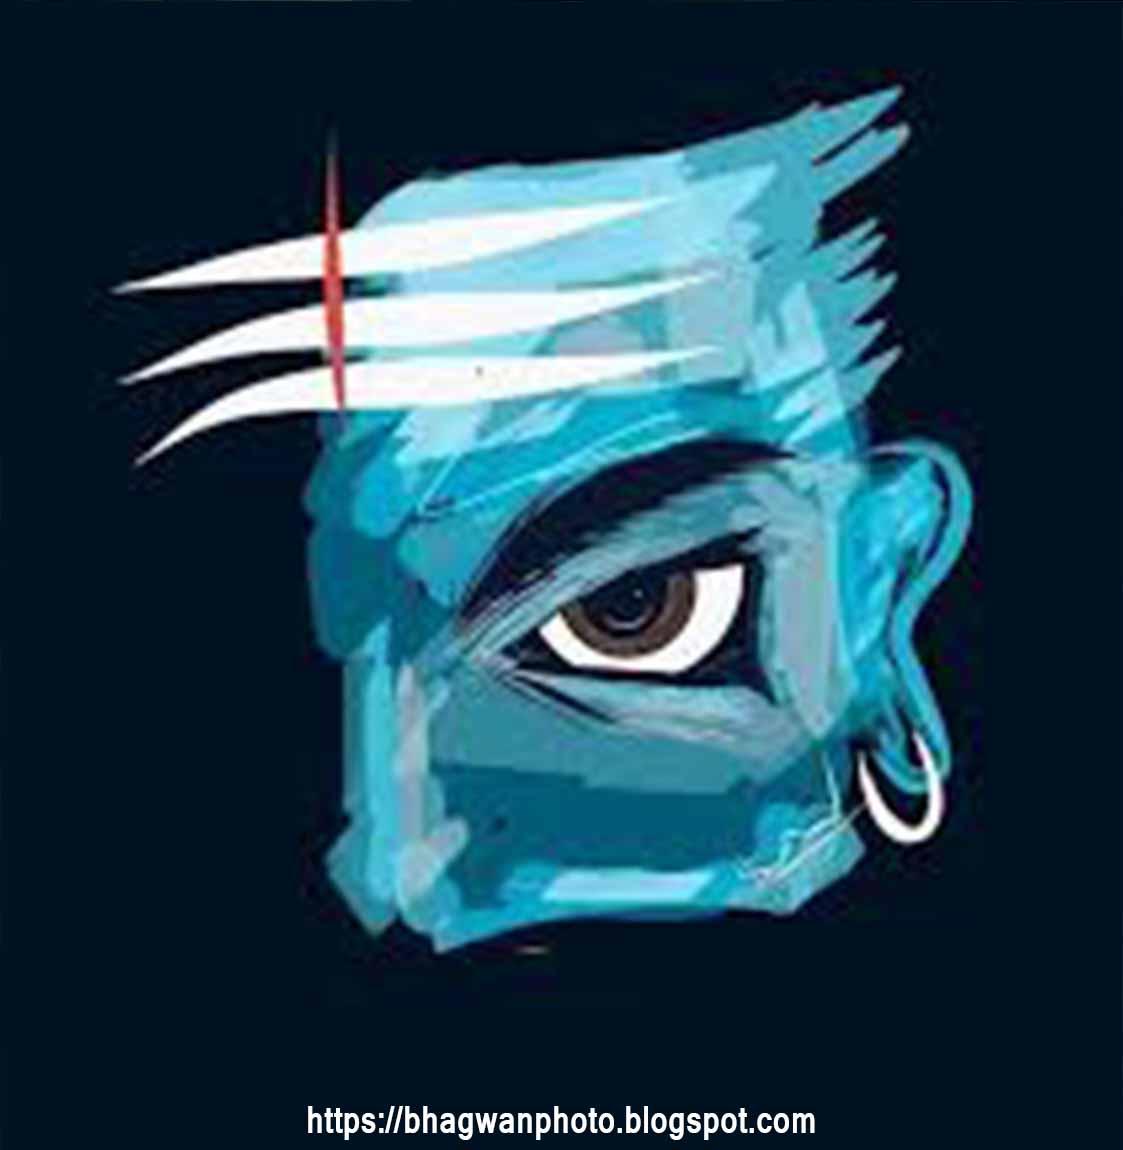 20 Mahakal Image Bhagwan Photo Wallpaper For Mahakal Bhakt